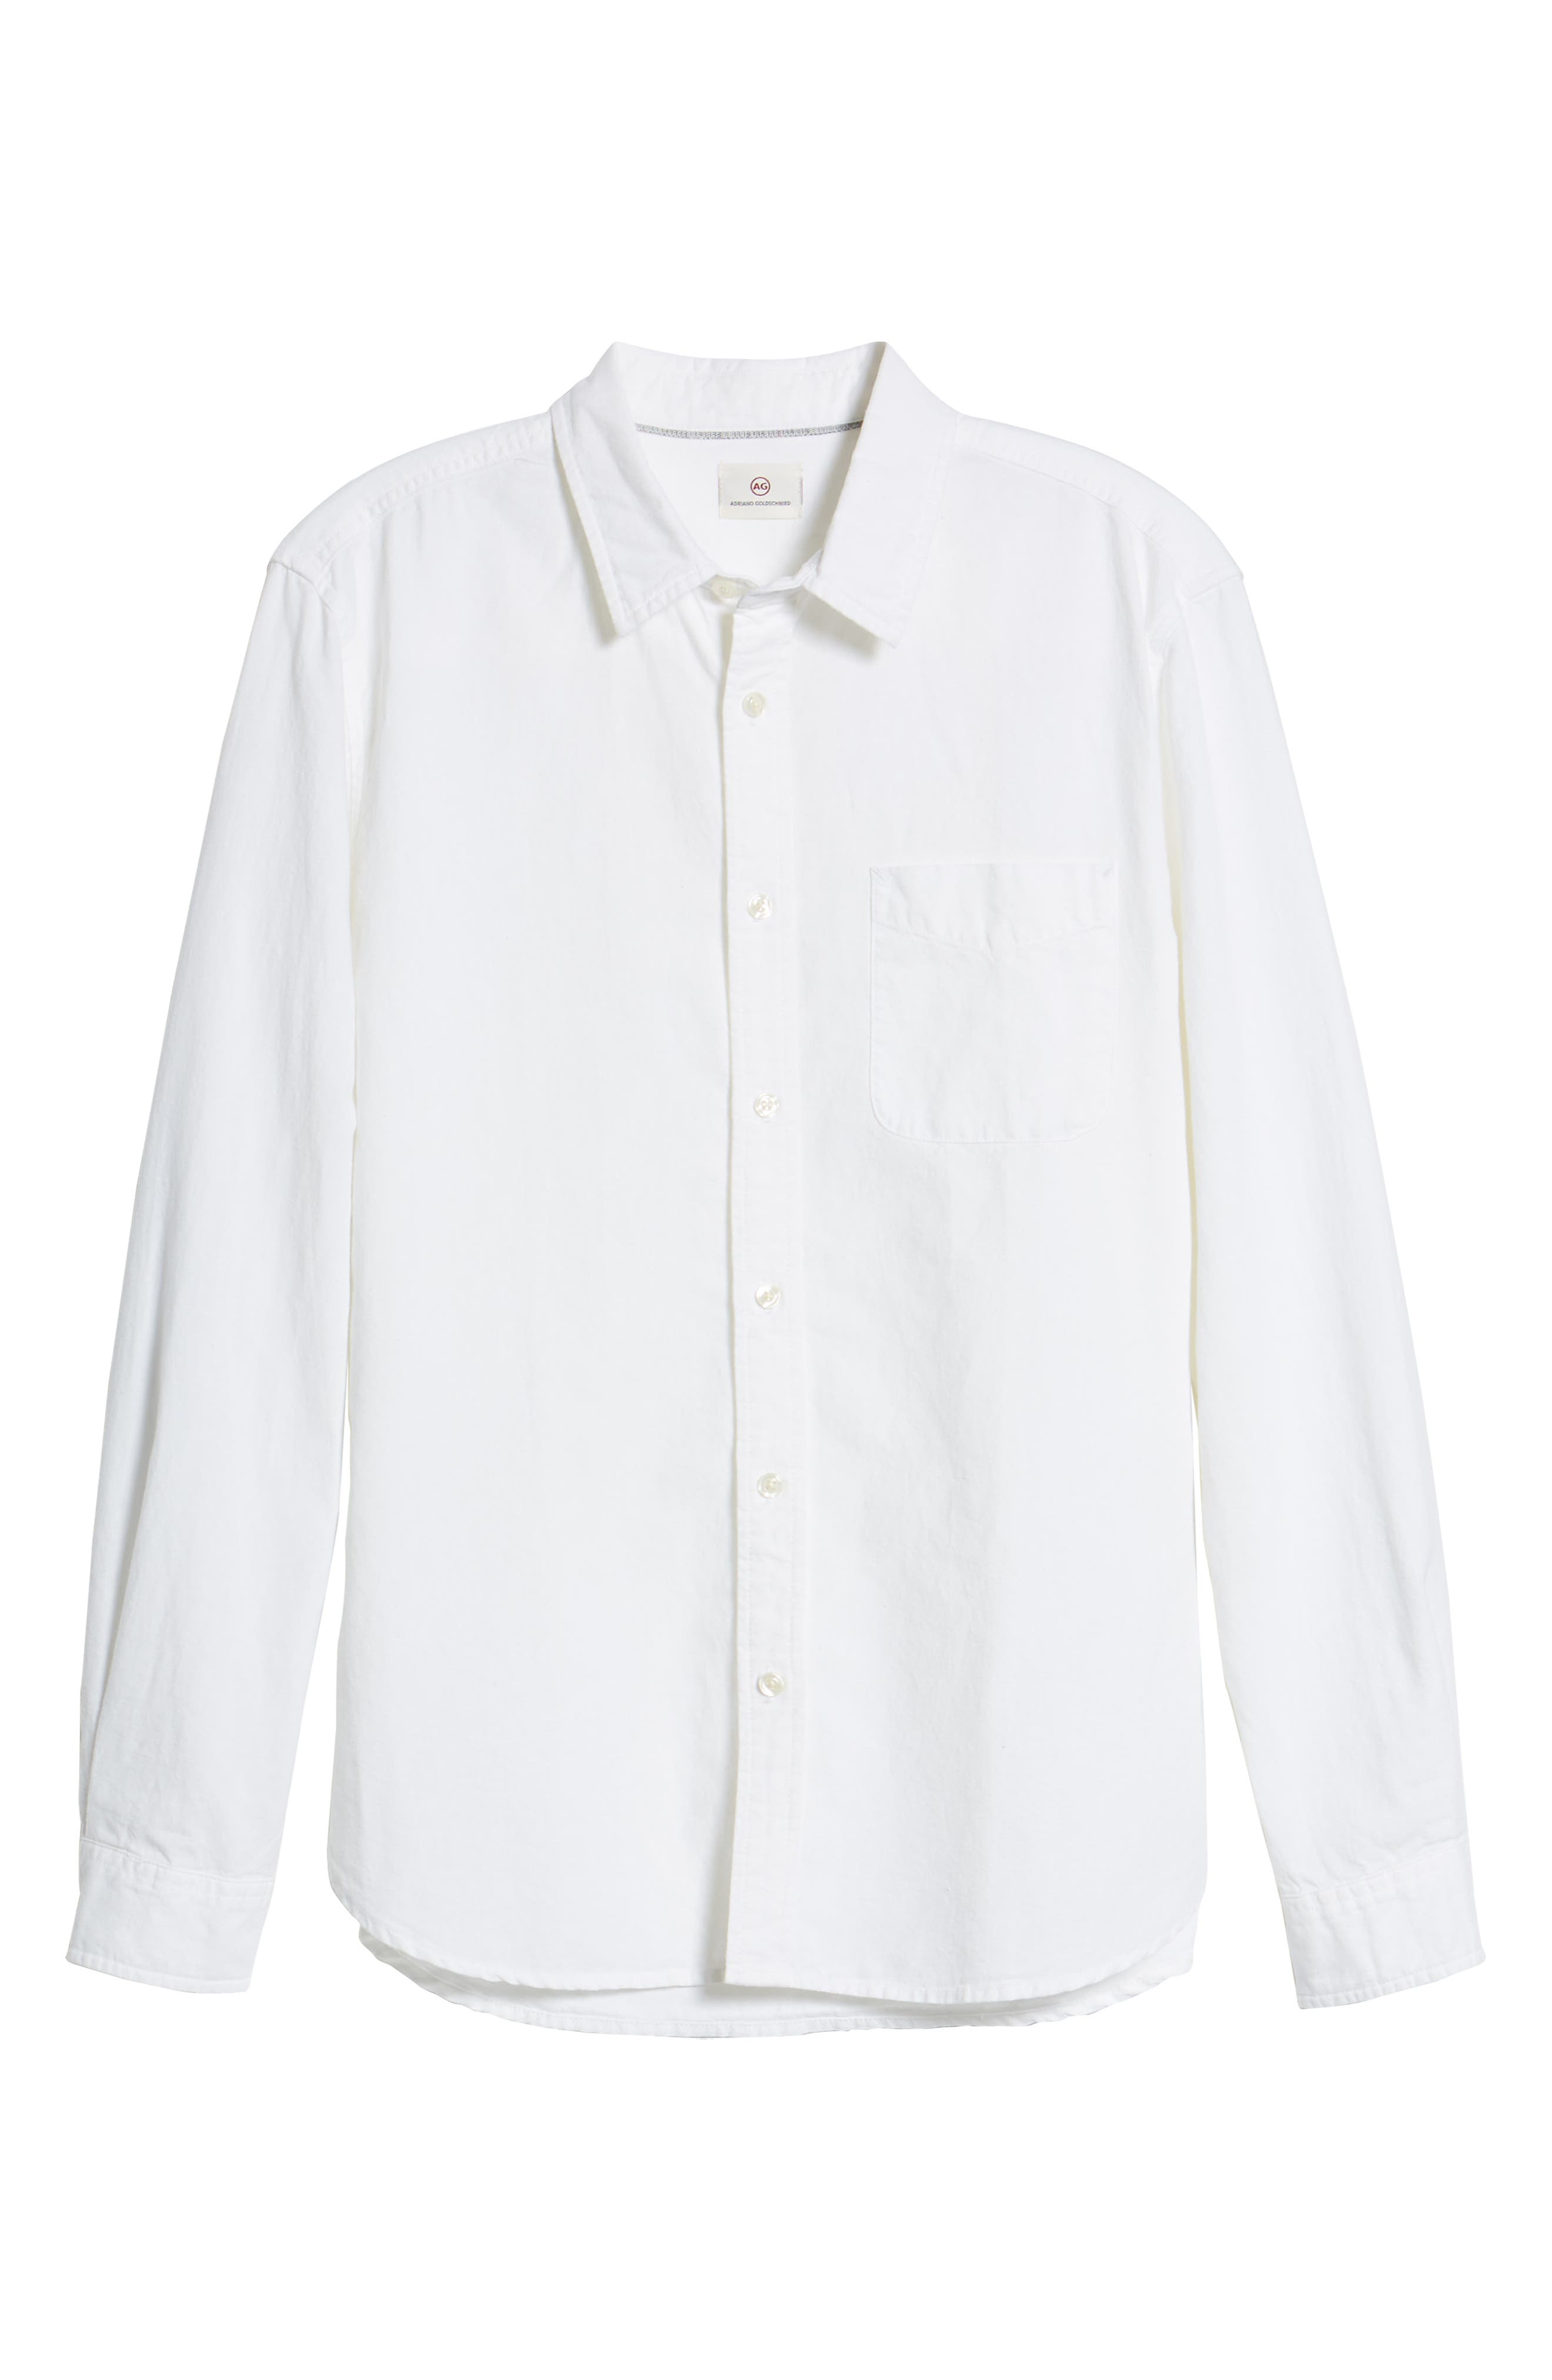 Colton Regular Fit Cotton & Linen Sport Shirt,                             Alternate thumbnail 6, color,                             TRUE WHITE